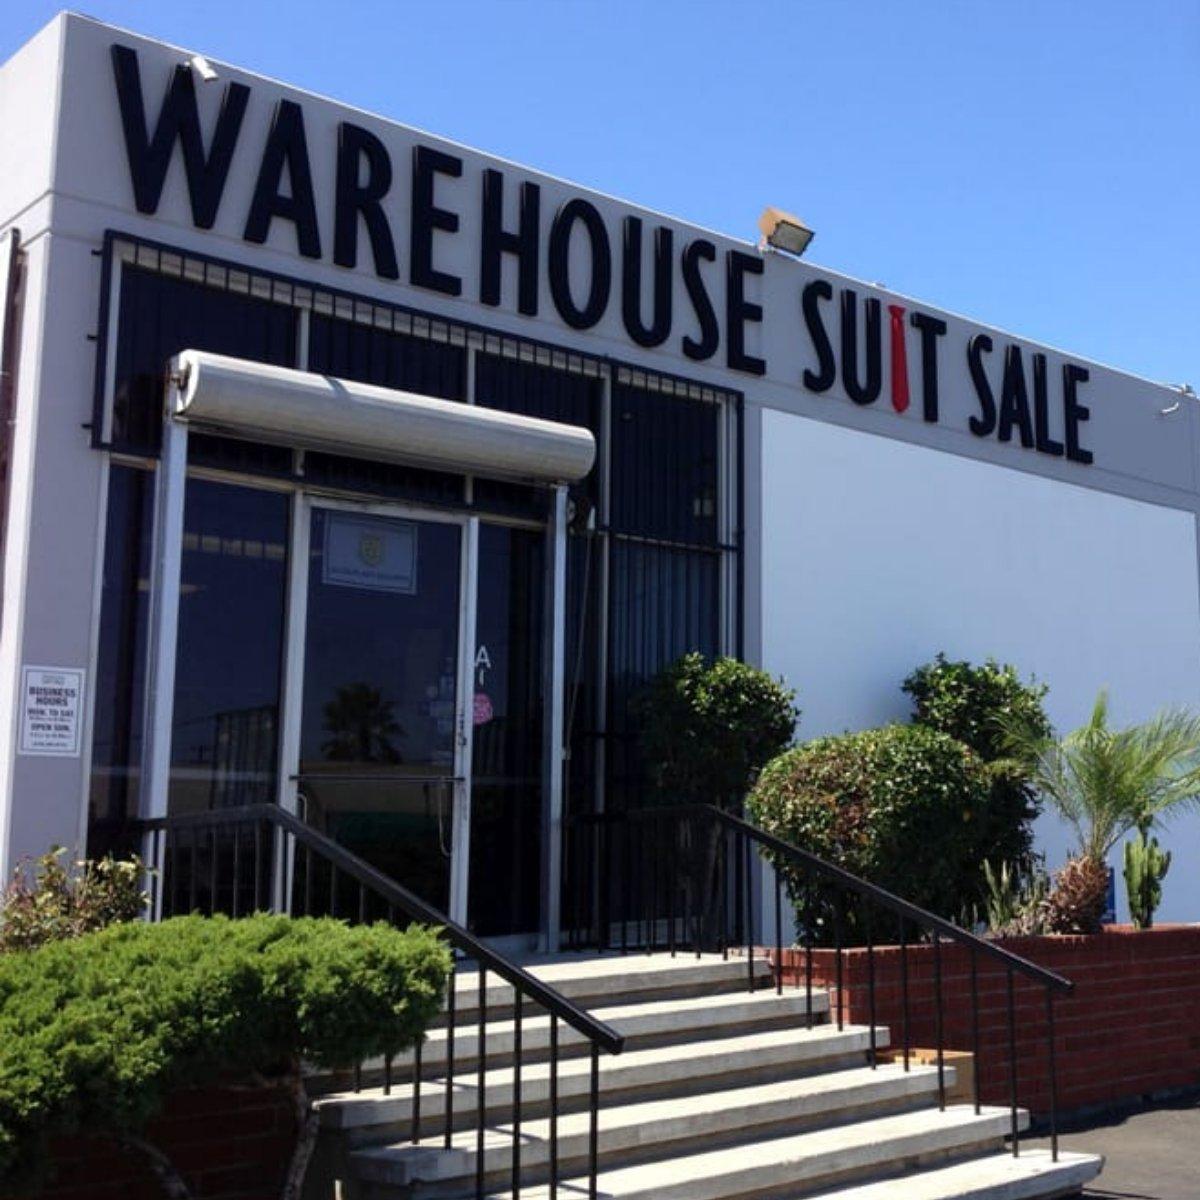 aa8d96def2 Warehouse Suit Sale on Twitter